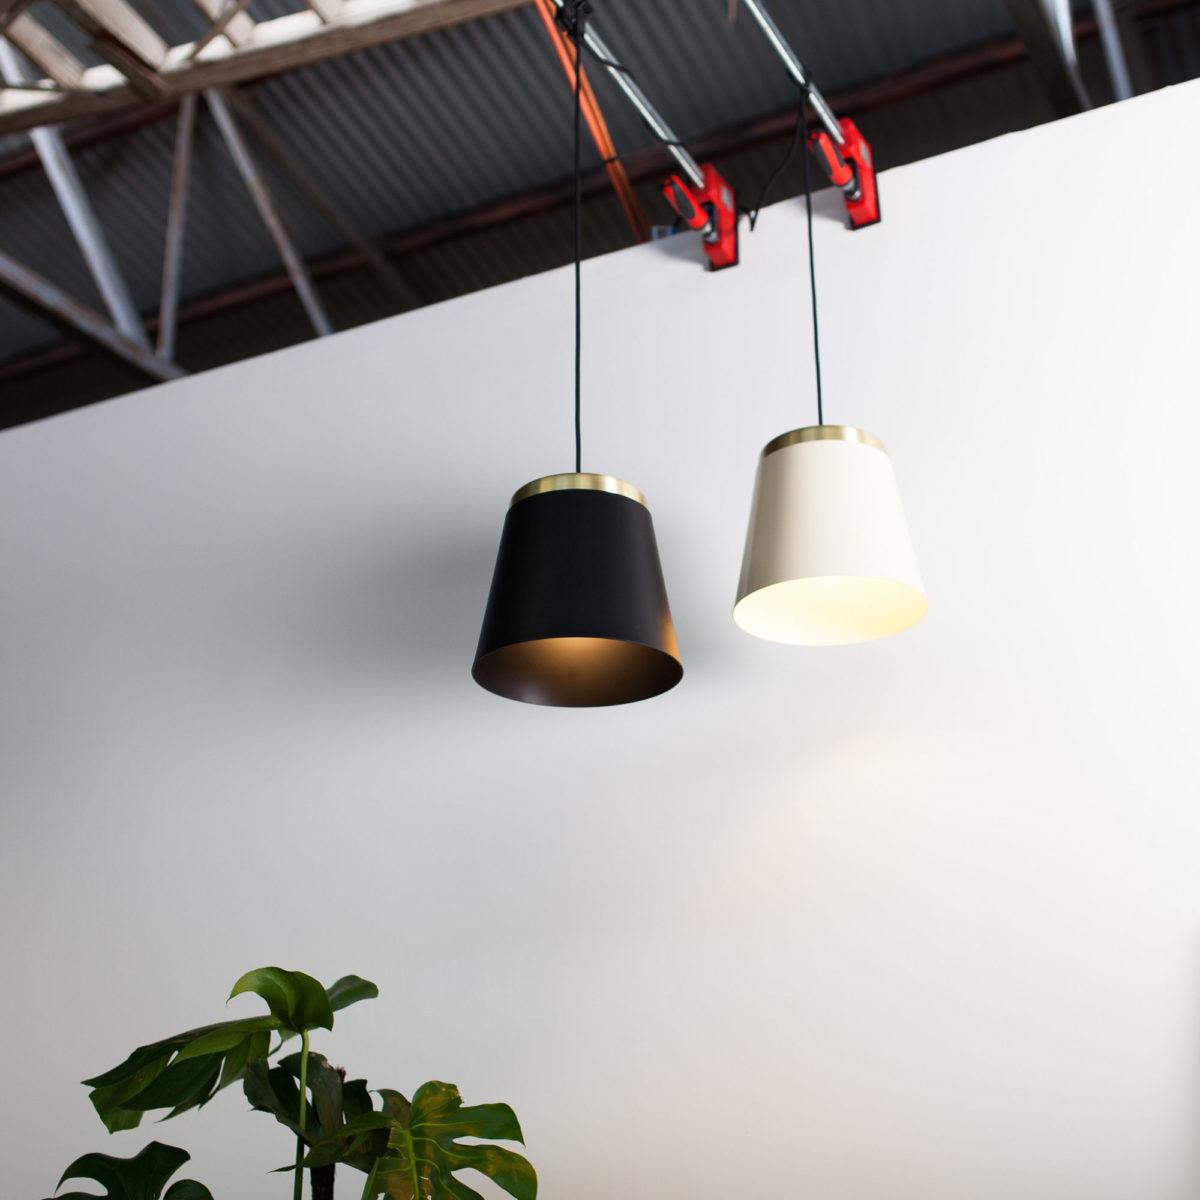 15hunt-furniture_baz-pendant-light-1200x1200.jpg